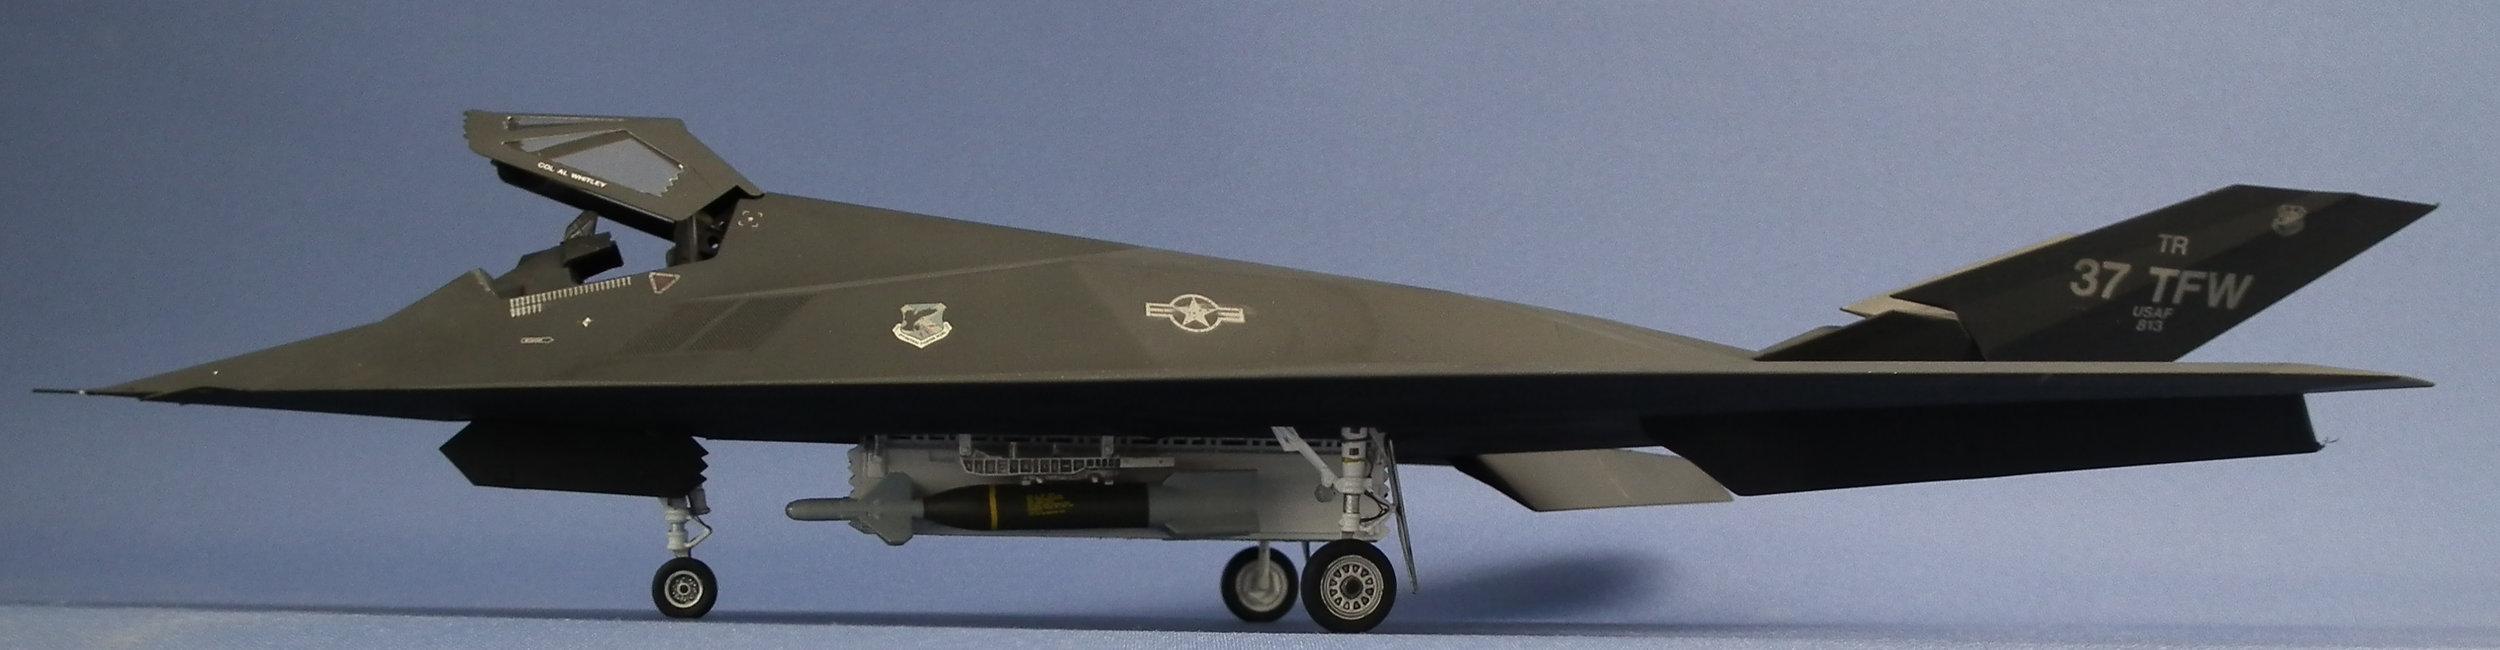 F-117A 3.JPG